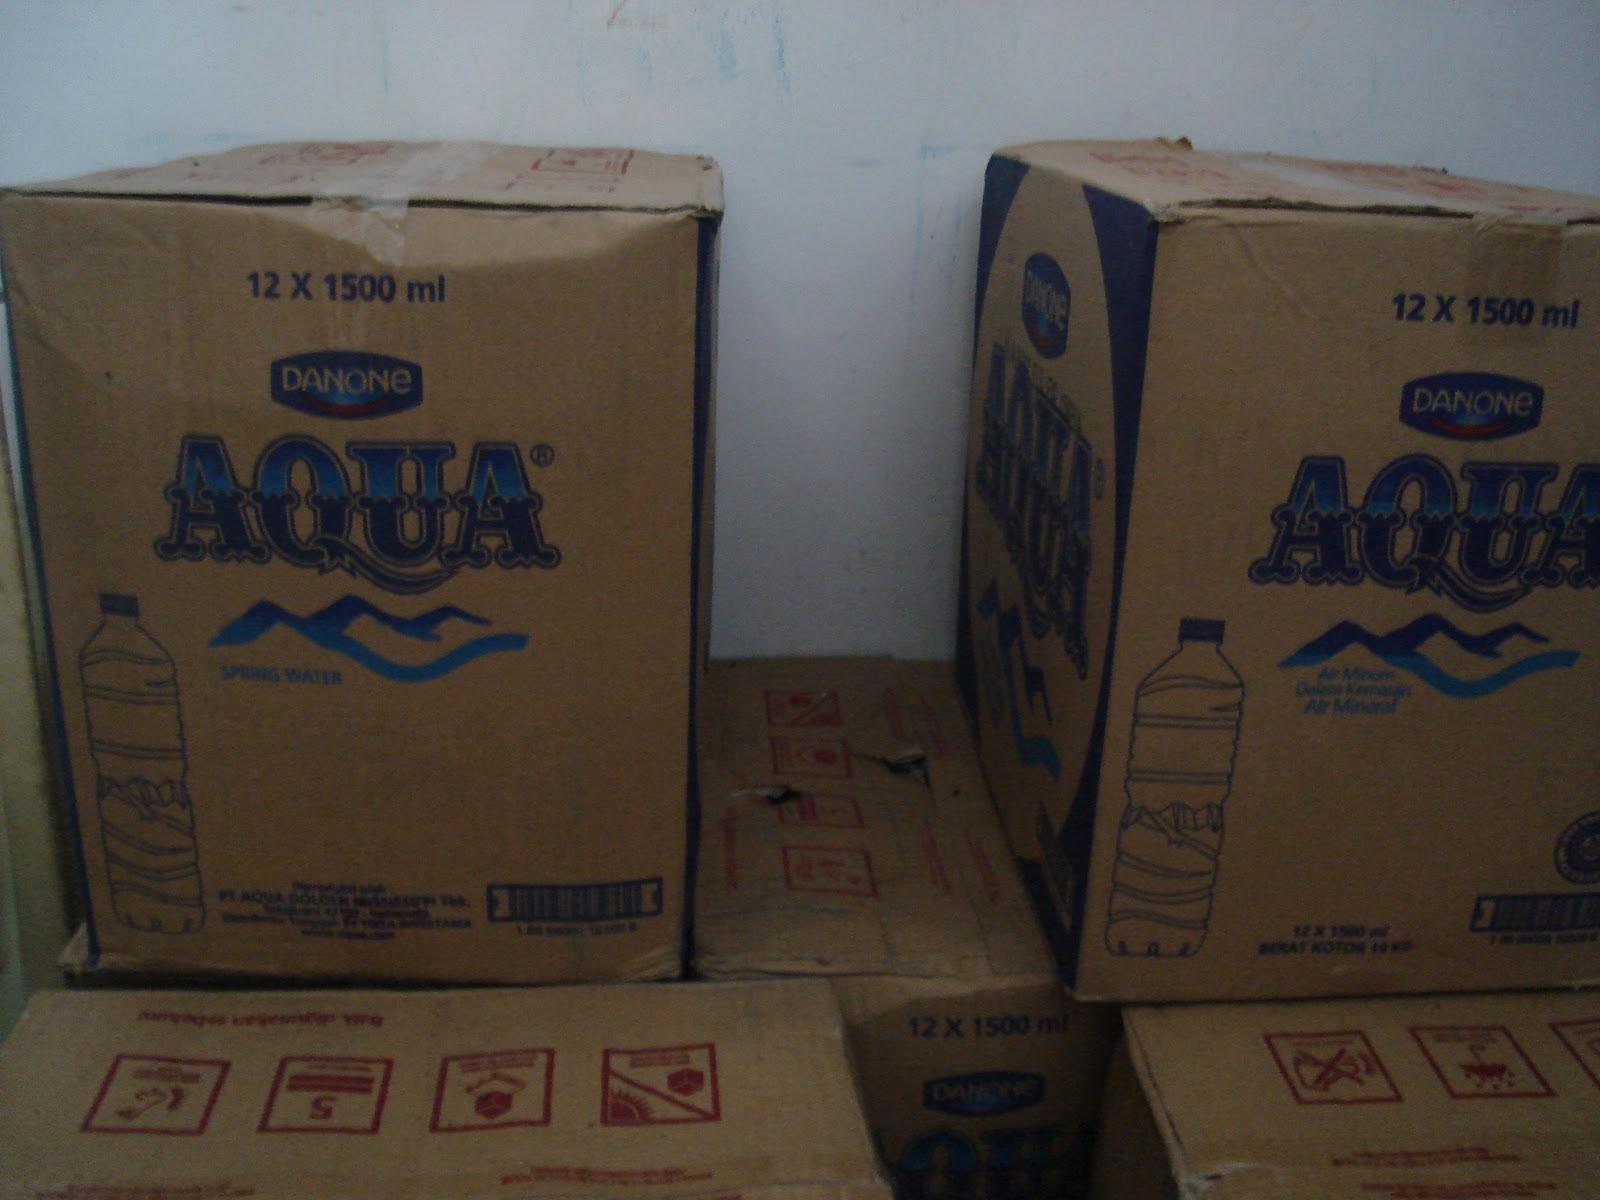 Aqua Botol 1500 Ml Bottle Multipack 6s 1500ml X 12pcs Jabodetabek Home Service Baskoro